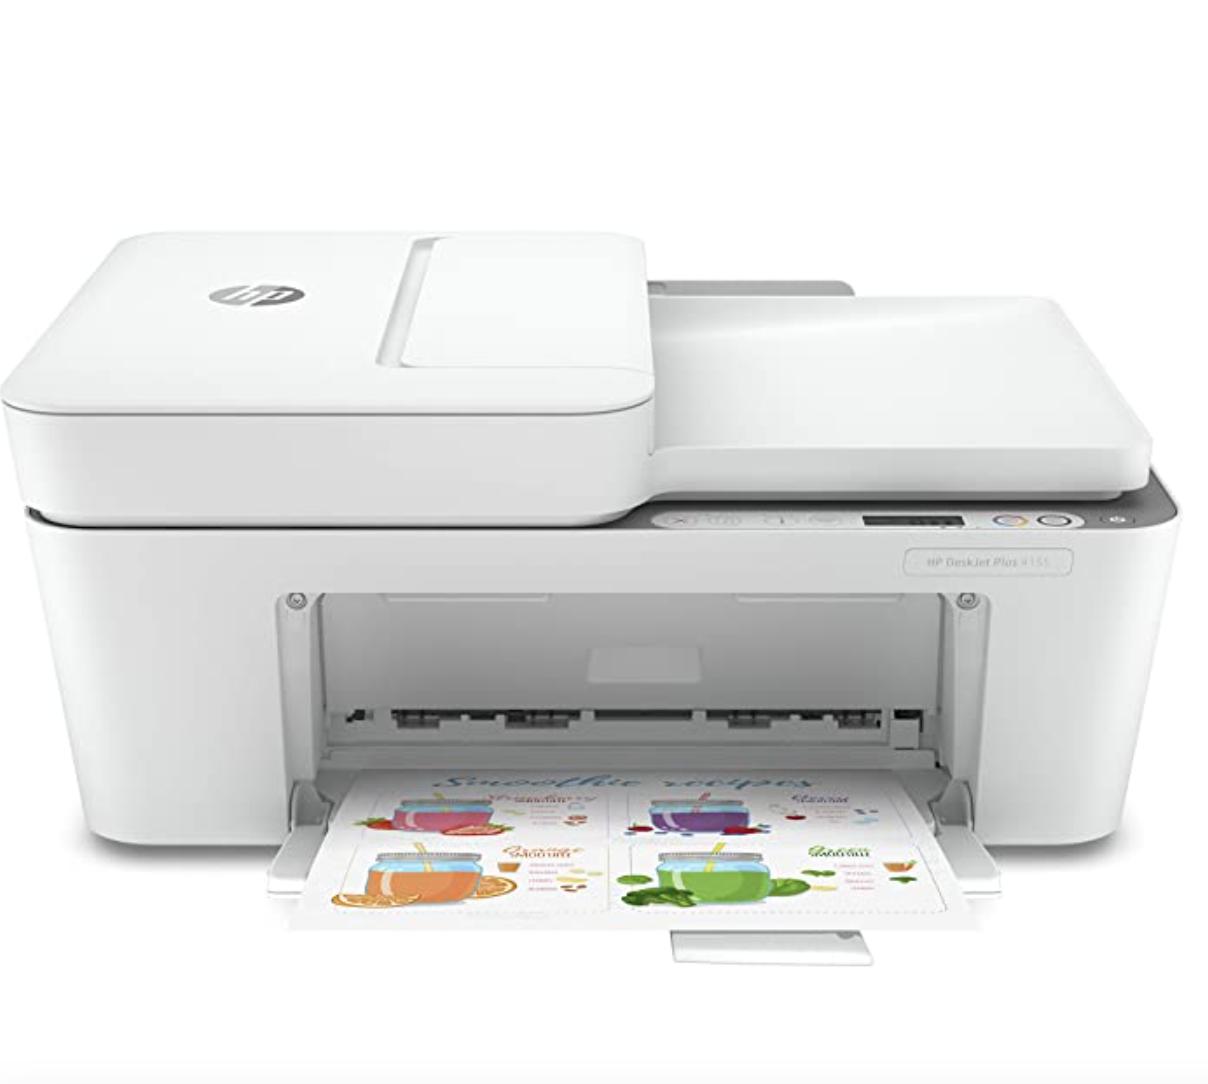 HP DeskJet Plus 4155 Wireless Printer